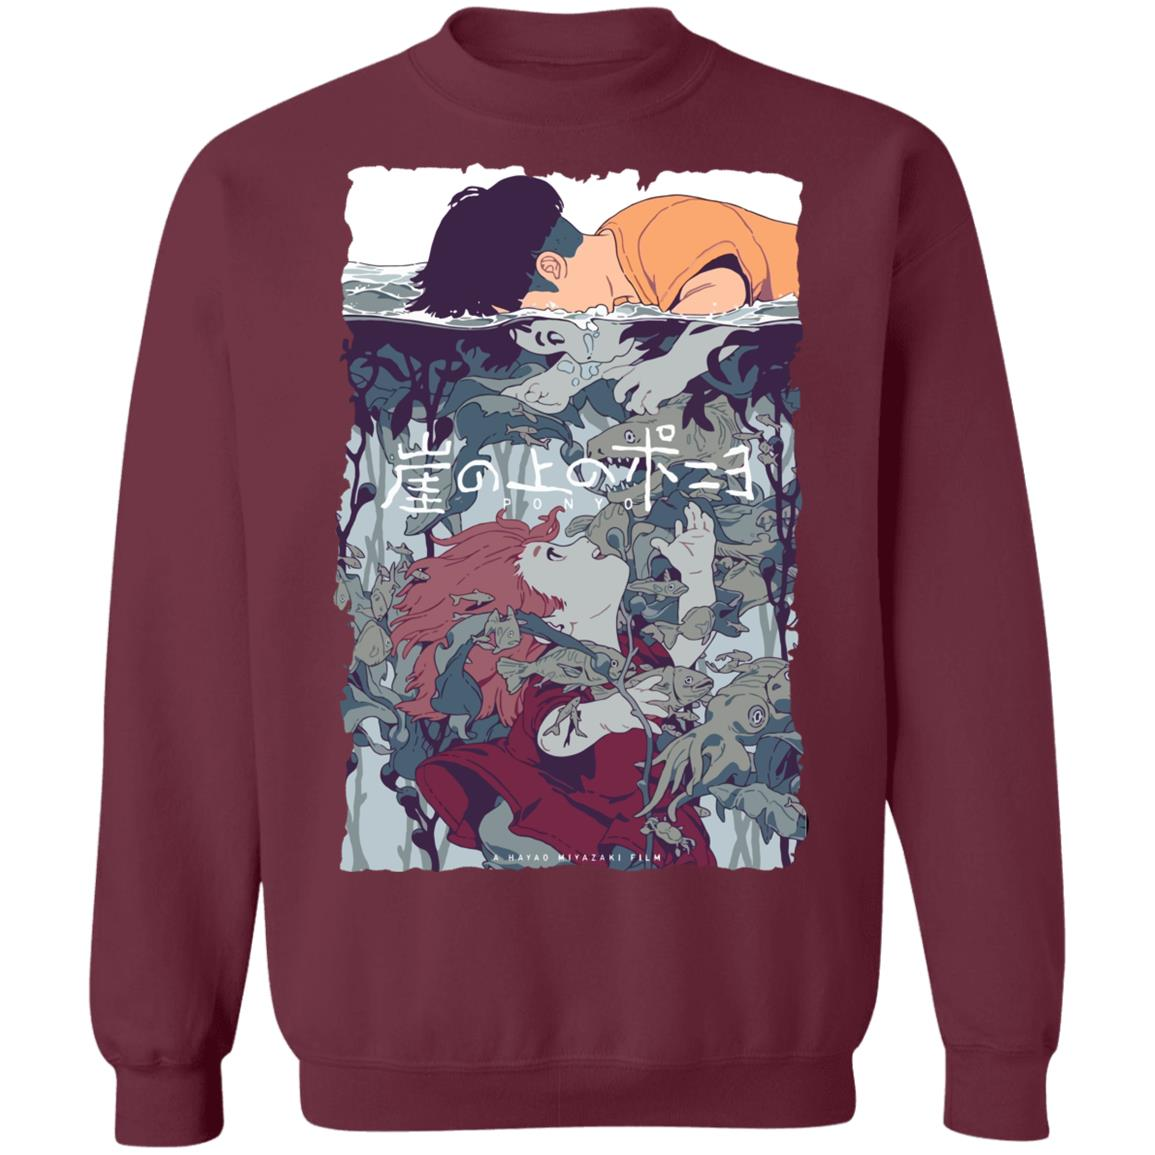 Ponyo and Sosuke Creative Art Sweatshirt Unisex